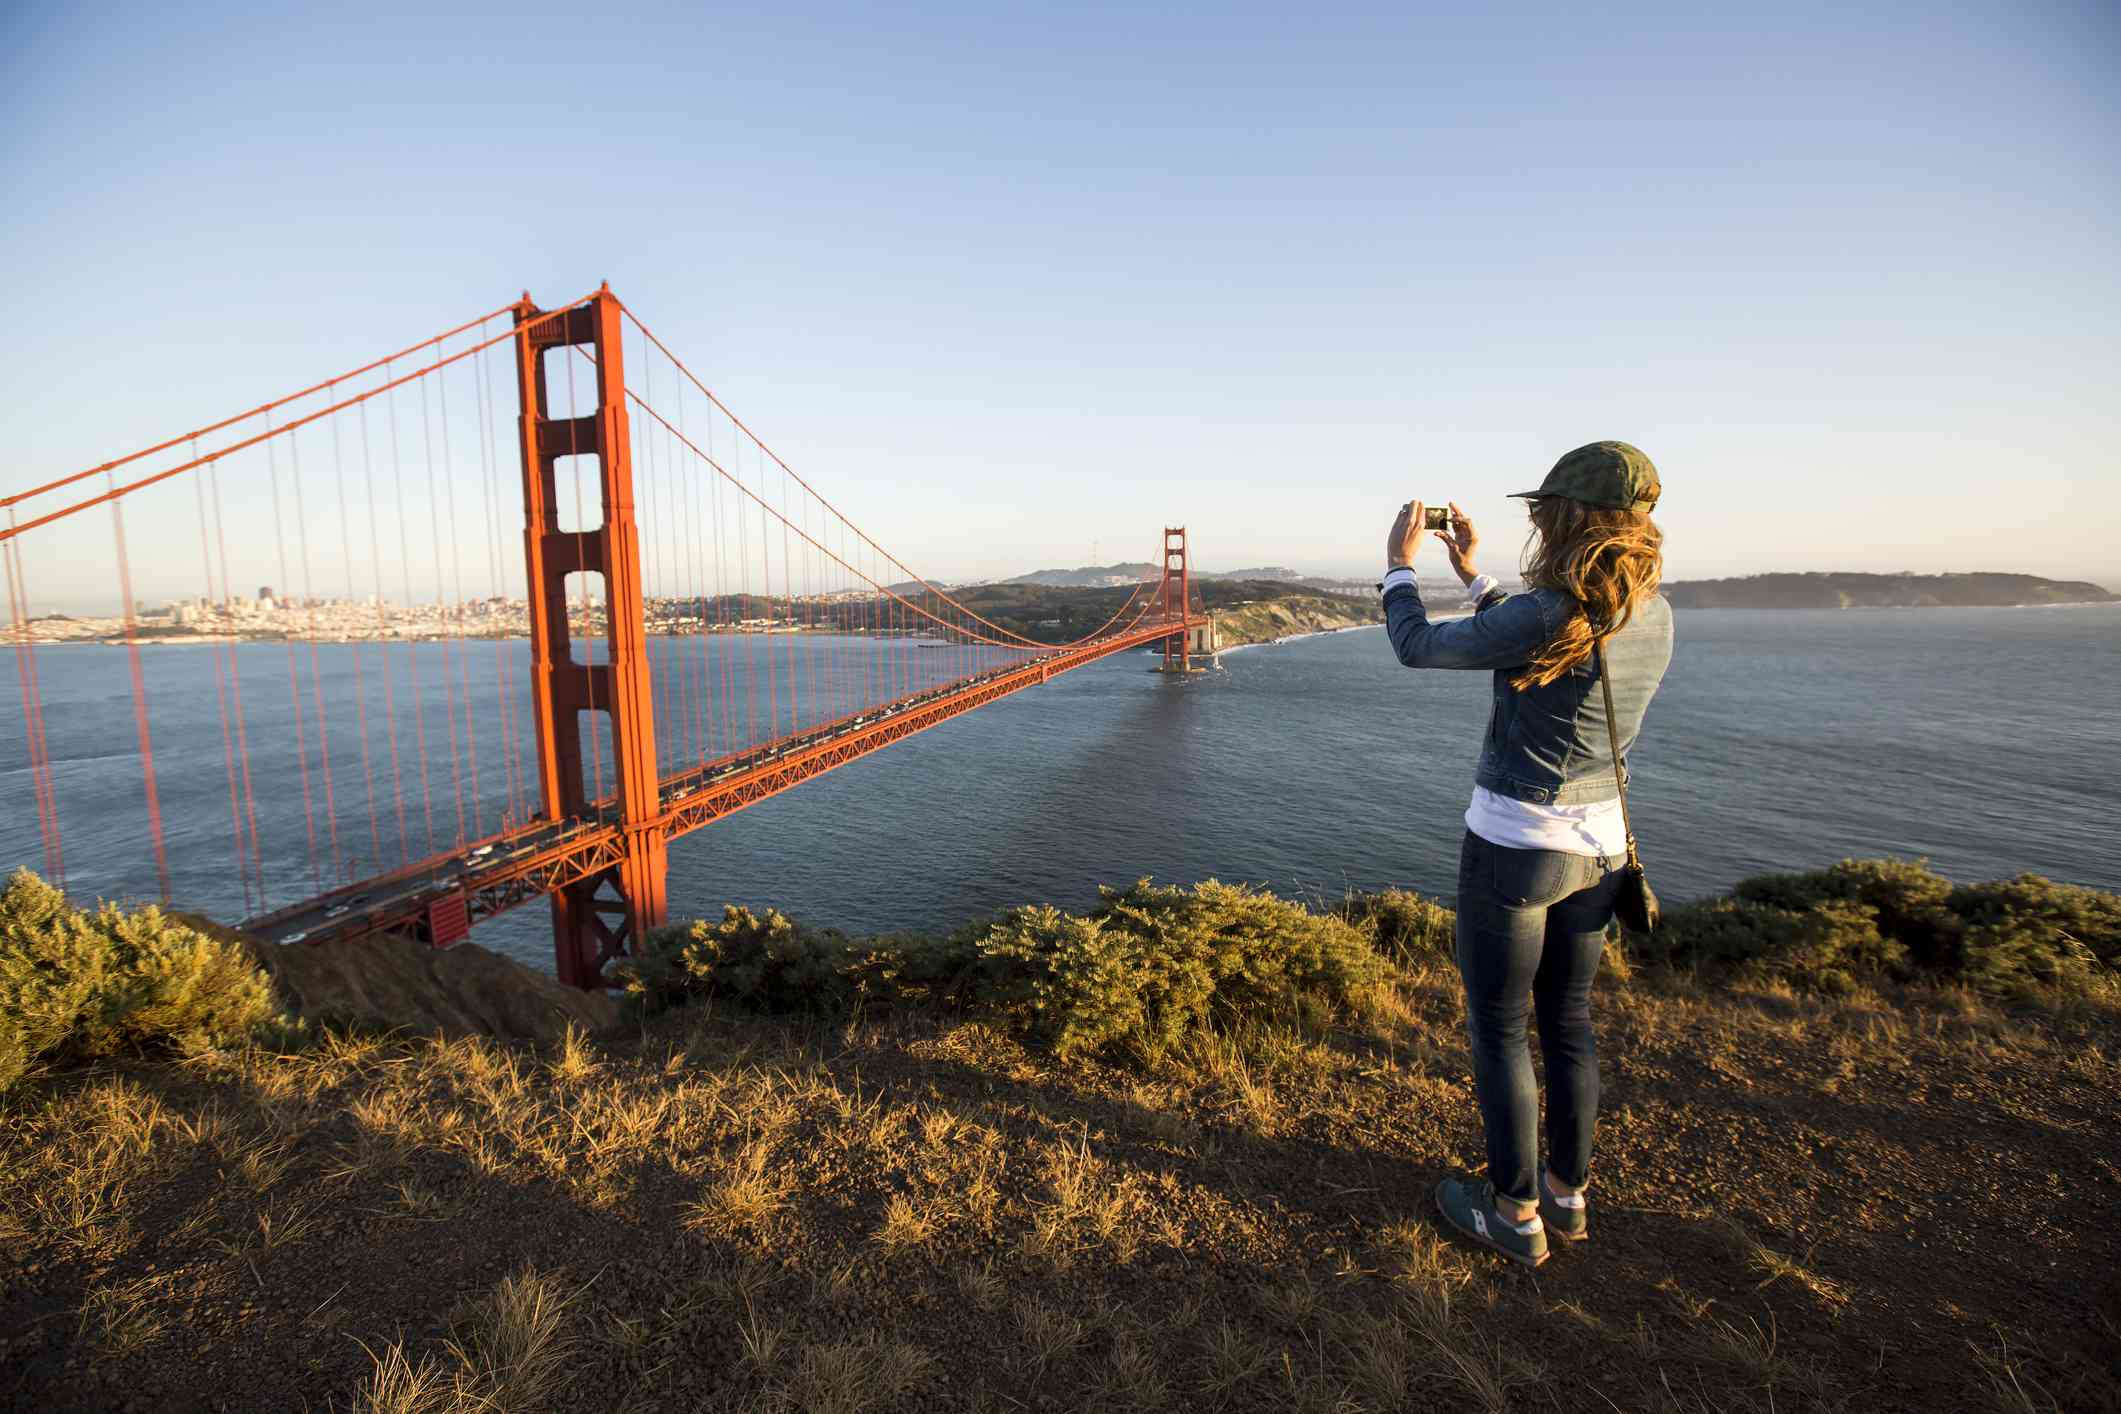 A woman taking a photo of the Golden Gate Bridge near sunset.